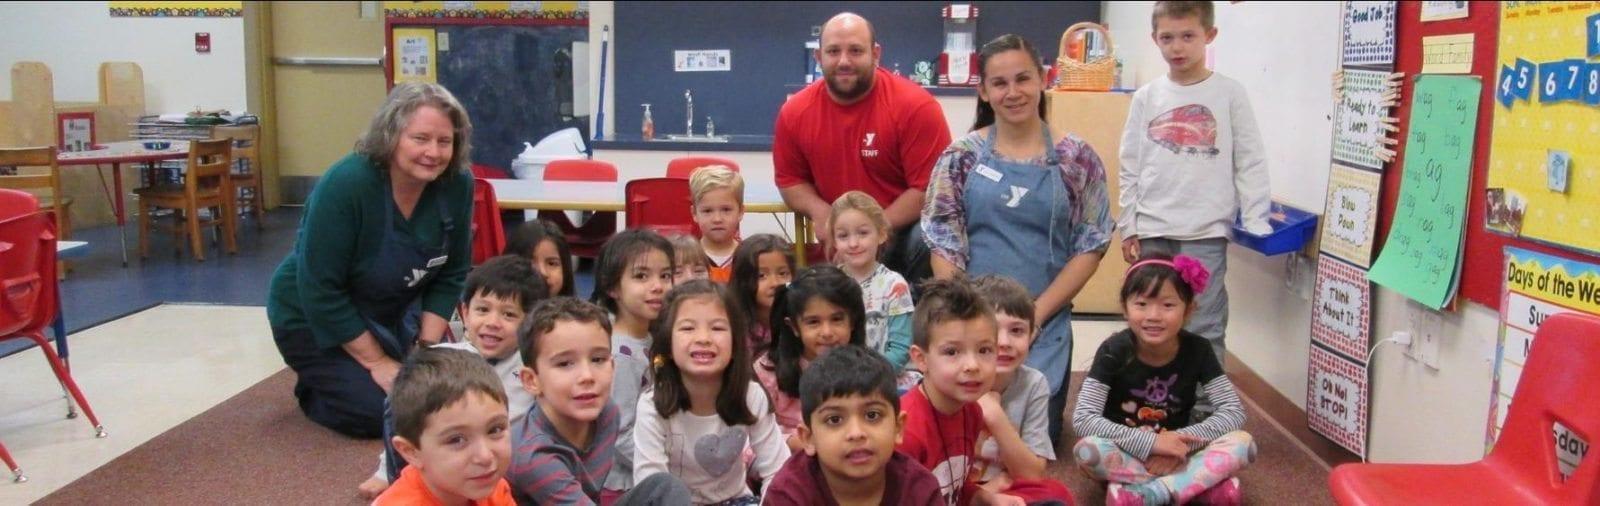 Full Day Kindergarten Page Header Image